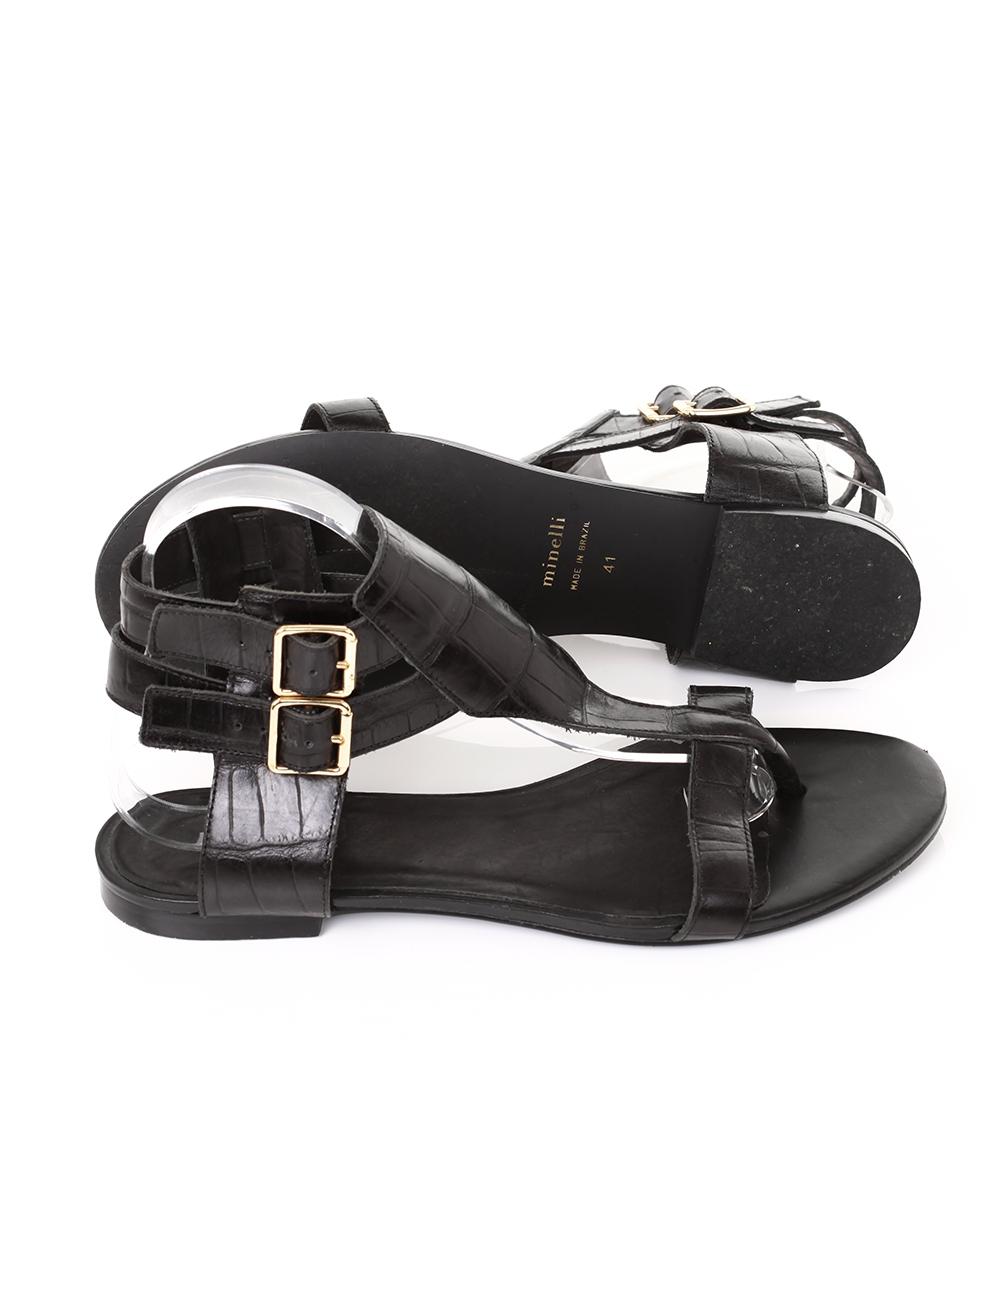 b791436c4f6 Chaussures MINELLI noir en cuir